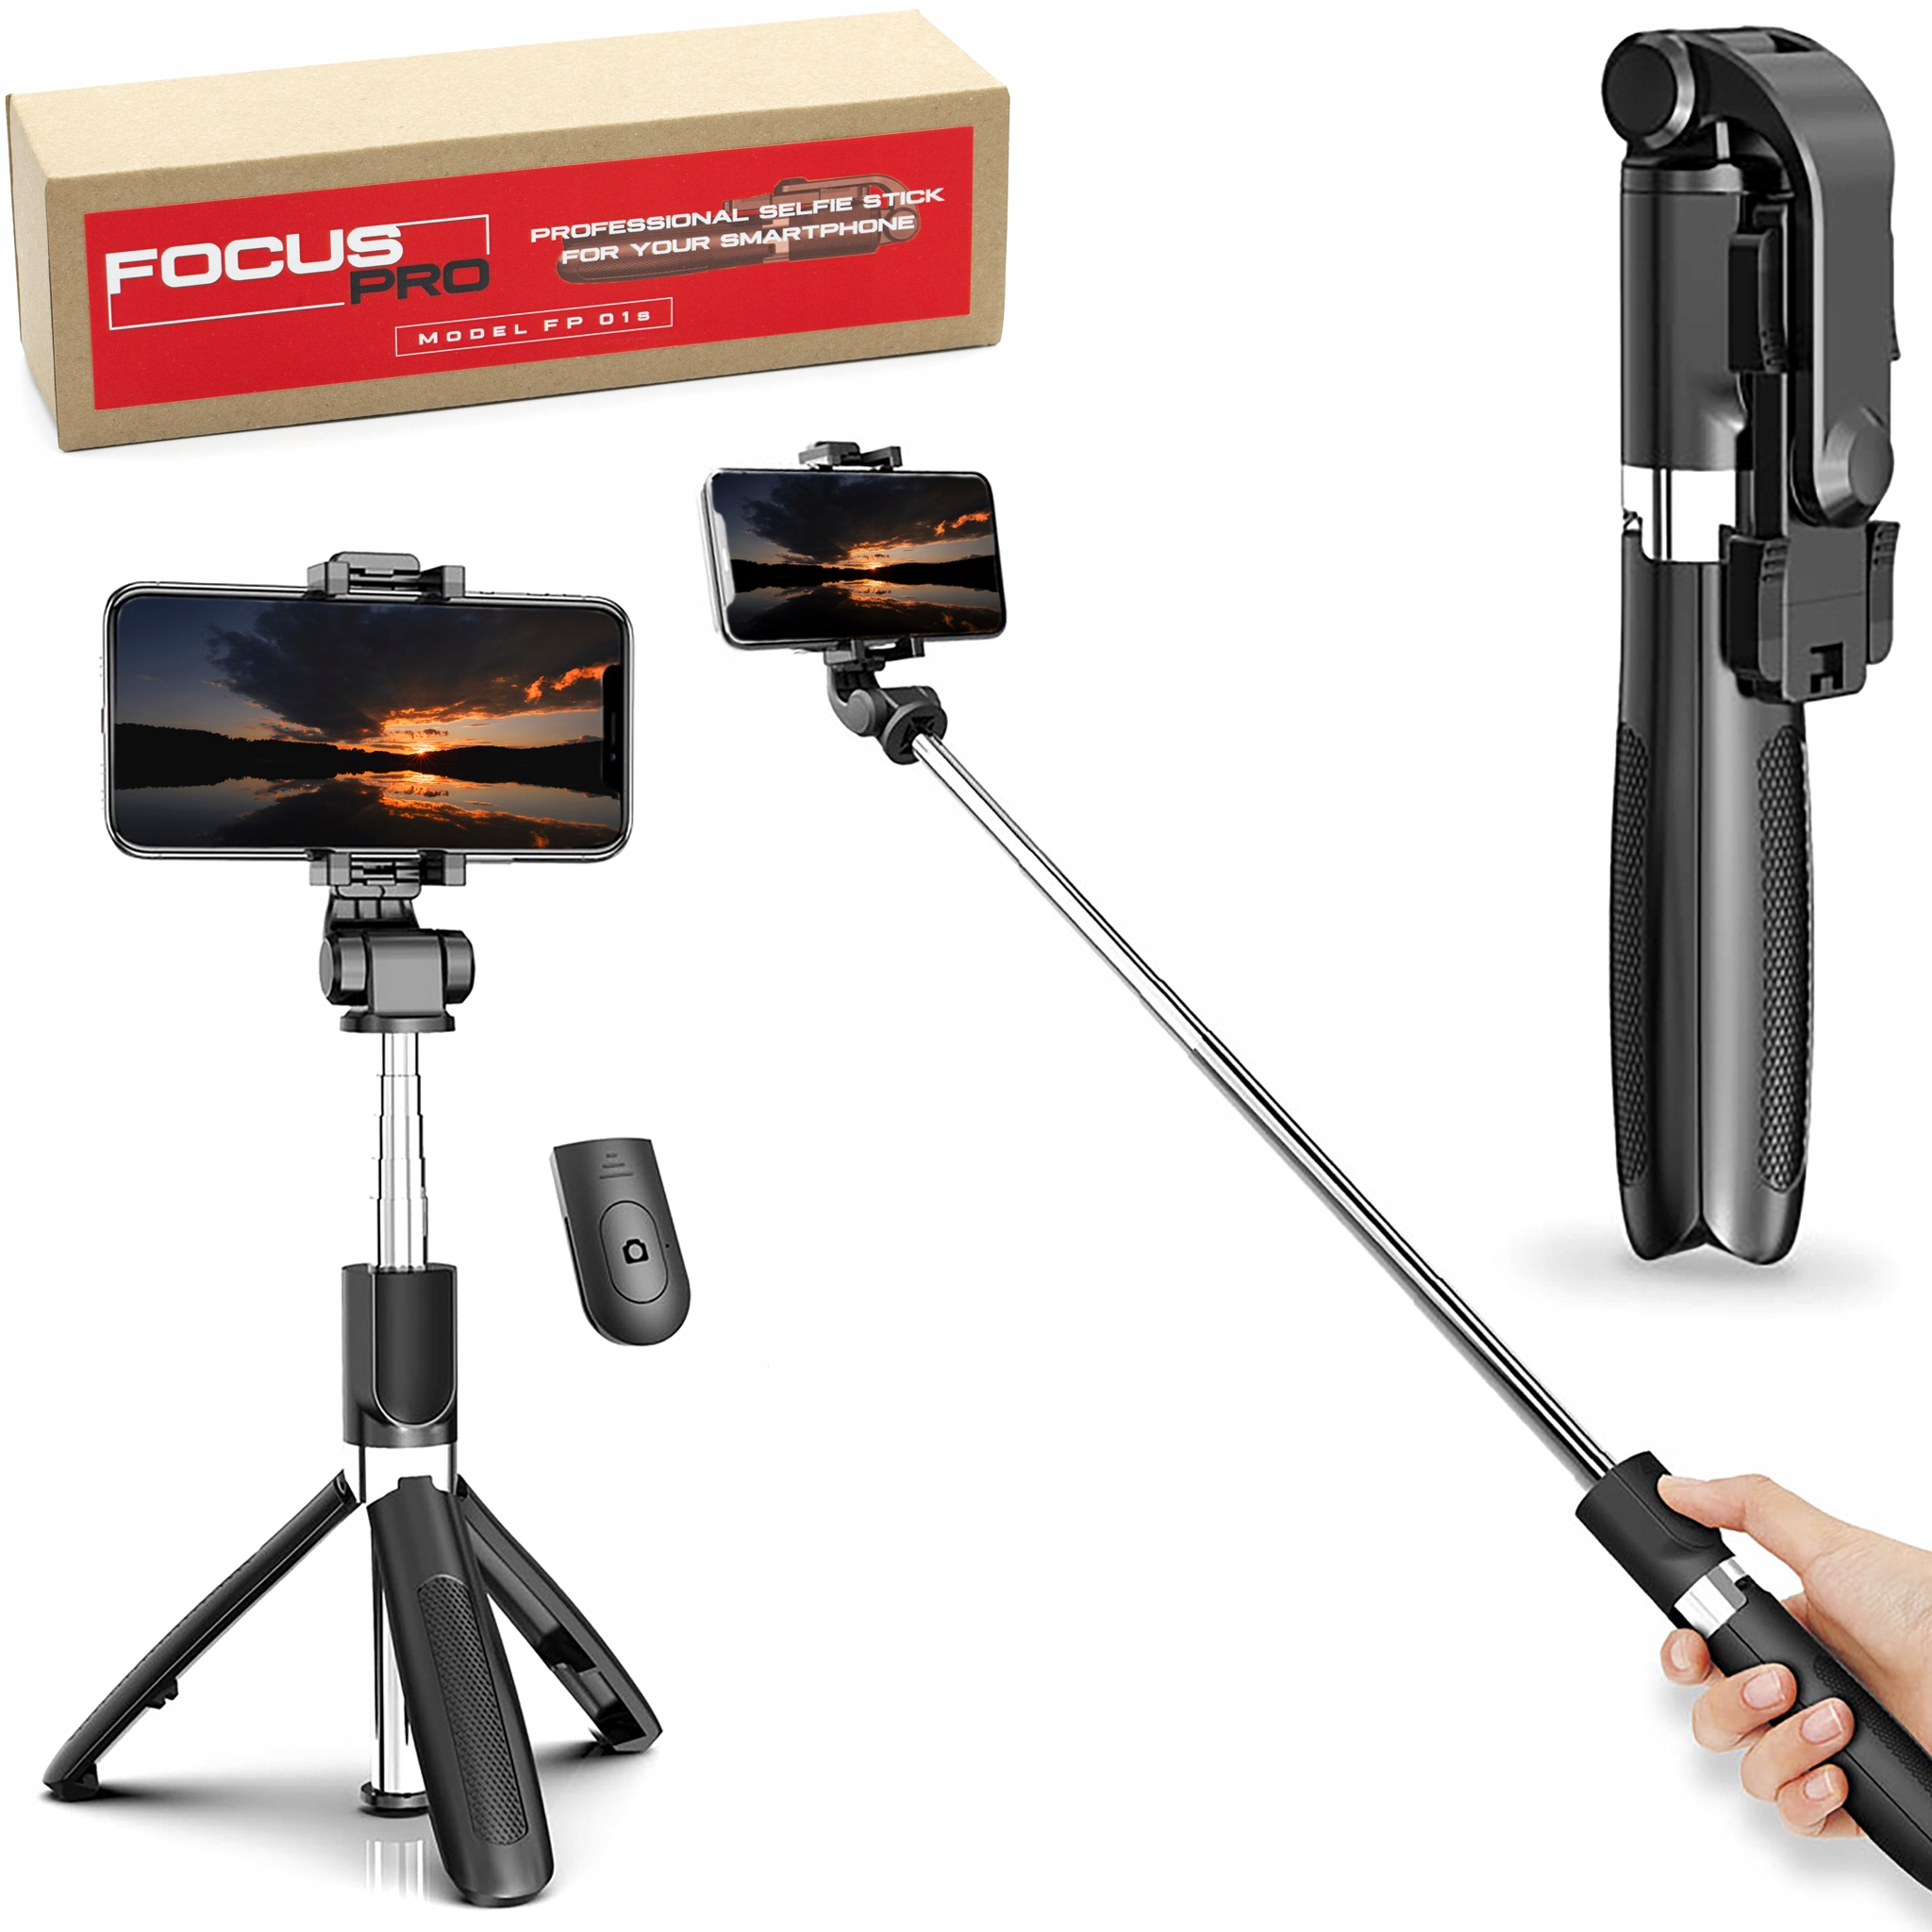 Focus Pro - Kijek Selfie Stick Tripod Statyw Pilot